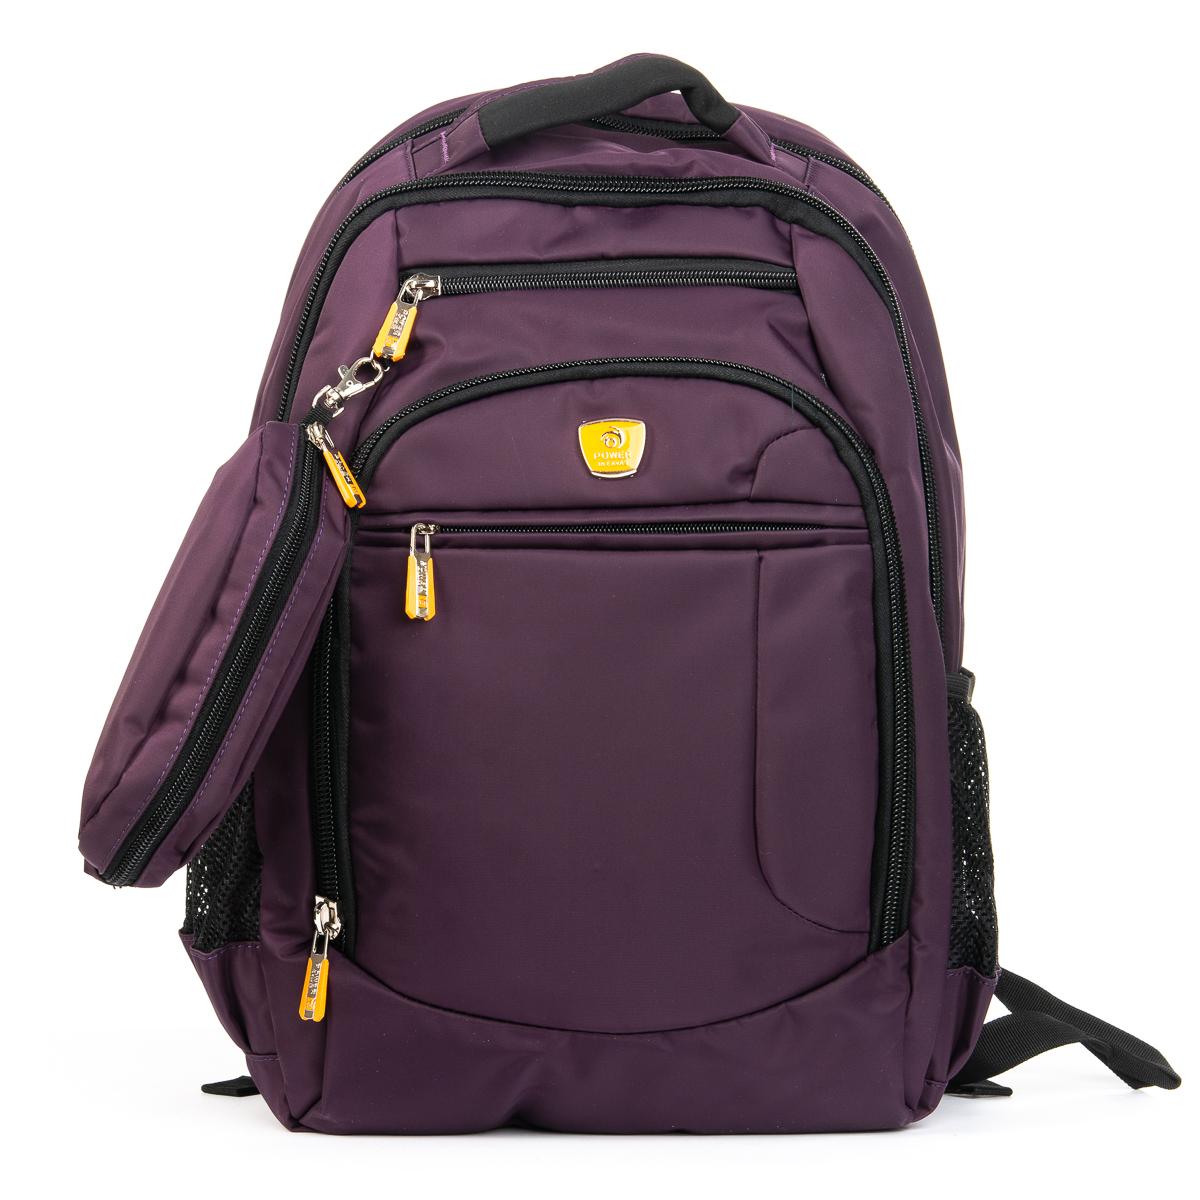 Рюкзак Городской нейлон Power In Eavas 5143 purple